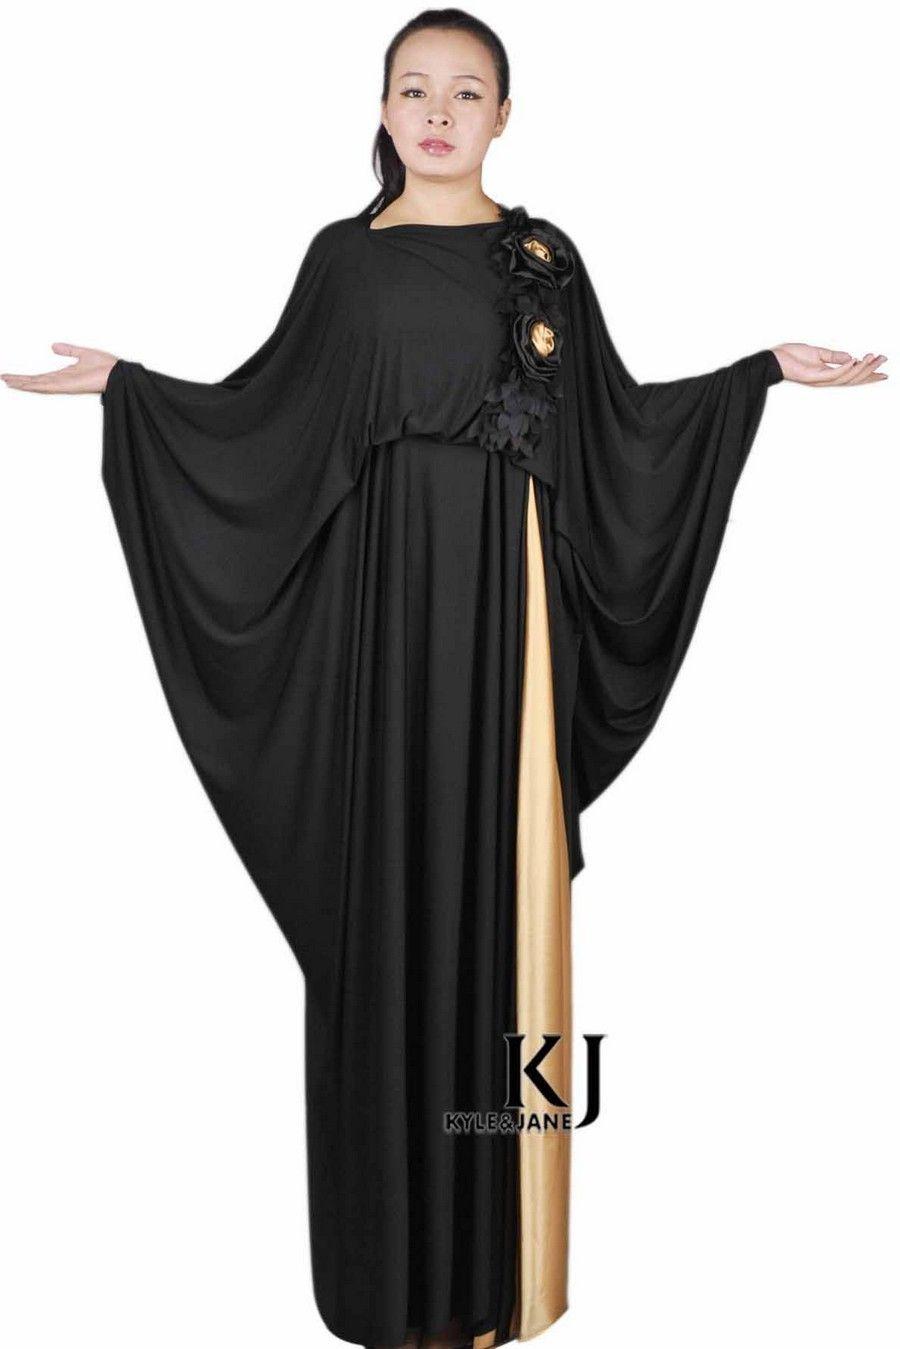 61f103944c847 abayas for pregnancy - Google Search | abaya designs | Godly woman ...